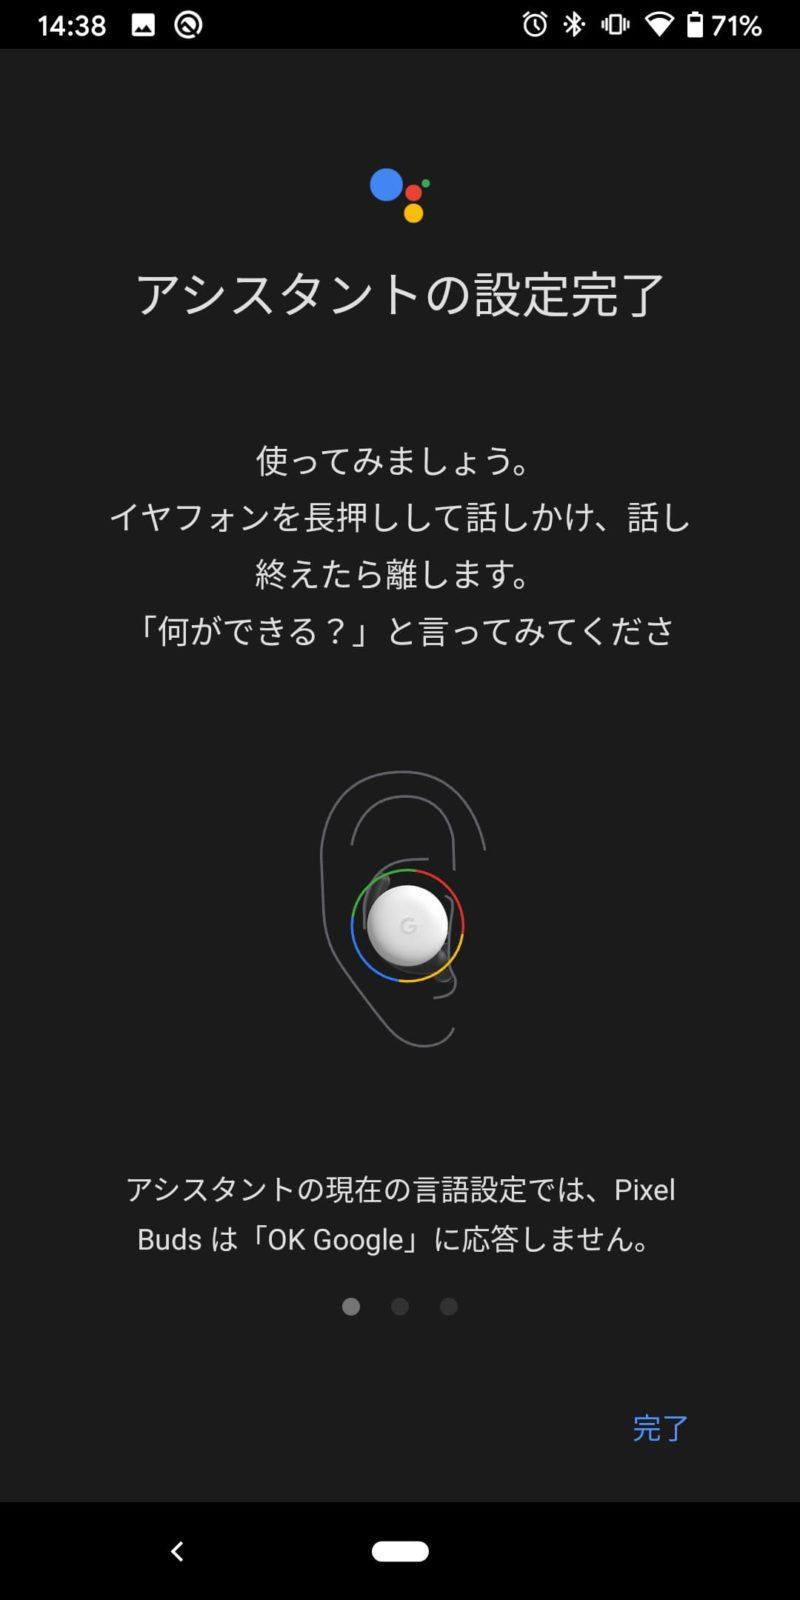 Screenshot 20200514 143812 800x1600-「Google Pixel Buds (2020)」を実機レビュー。完全ワイヤレスになって満足だけど、機能面は物足りないかも